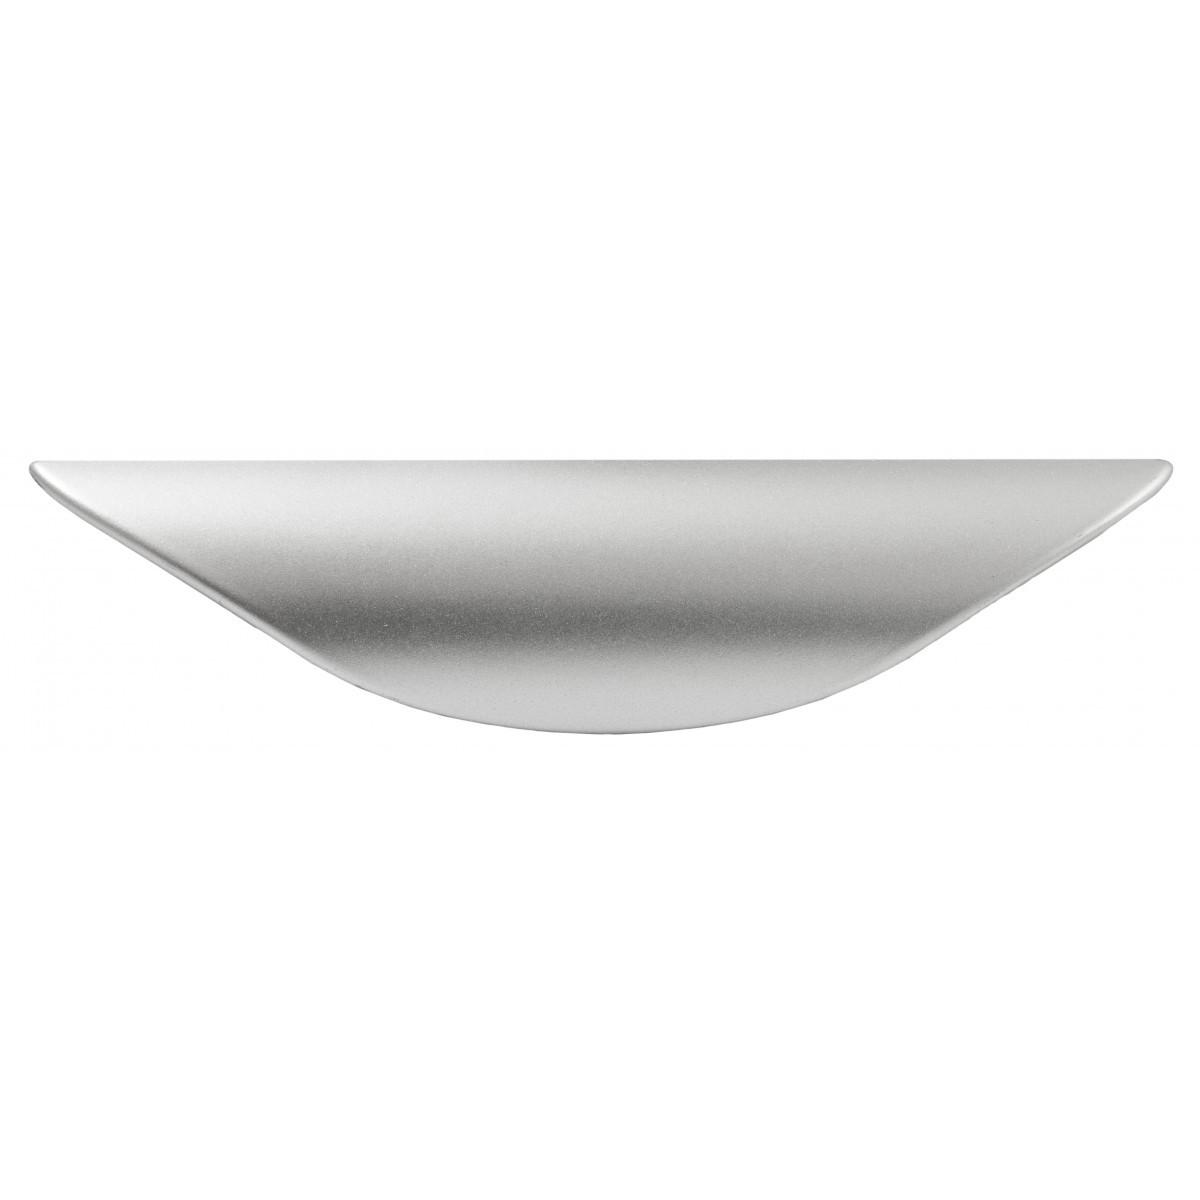 Ручка мебельная Ozkardesler 5117-03 MIDYE 96мм Матовый Хром